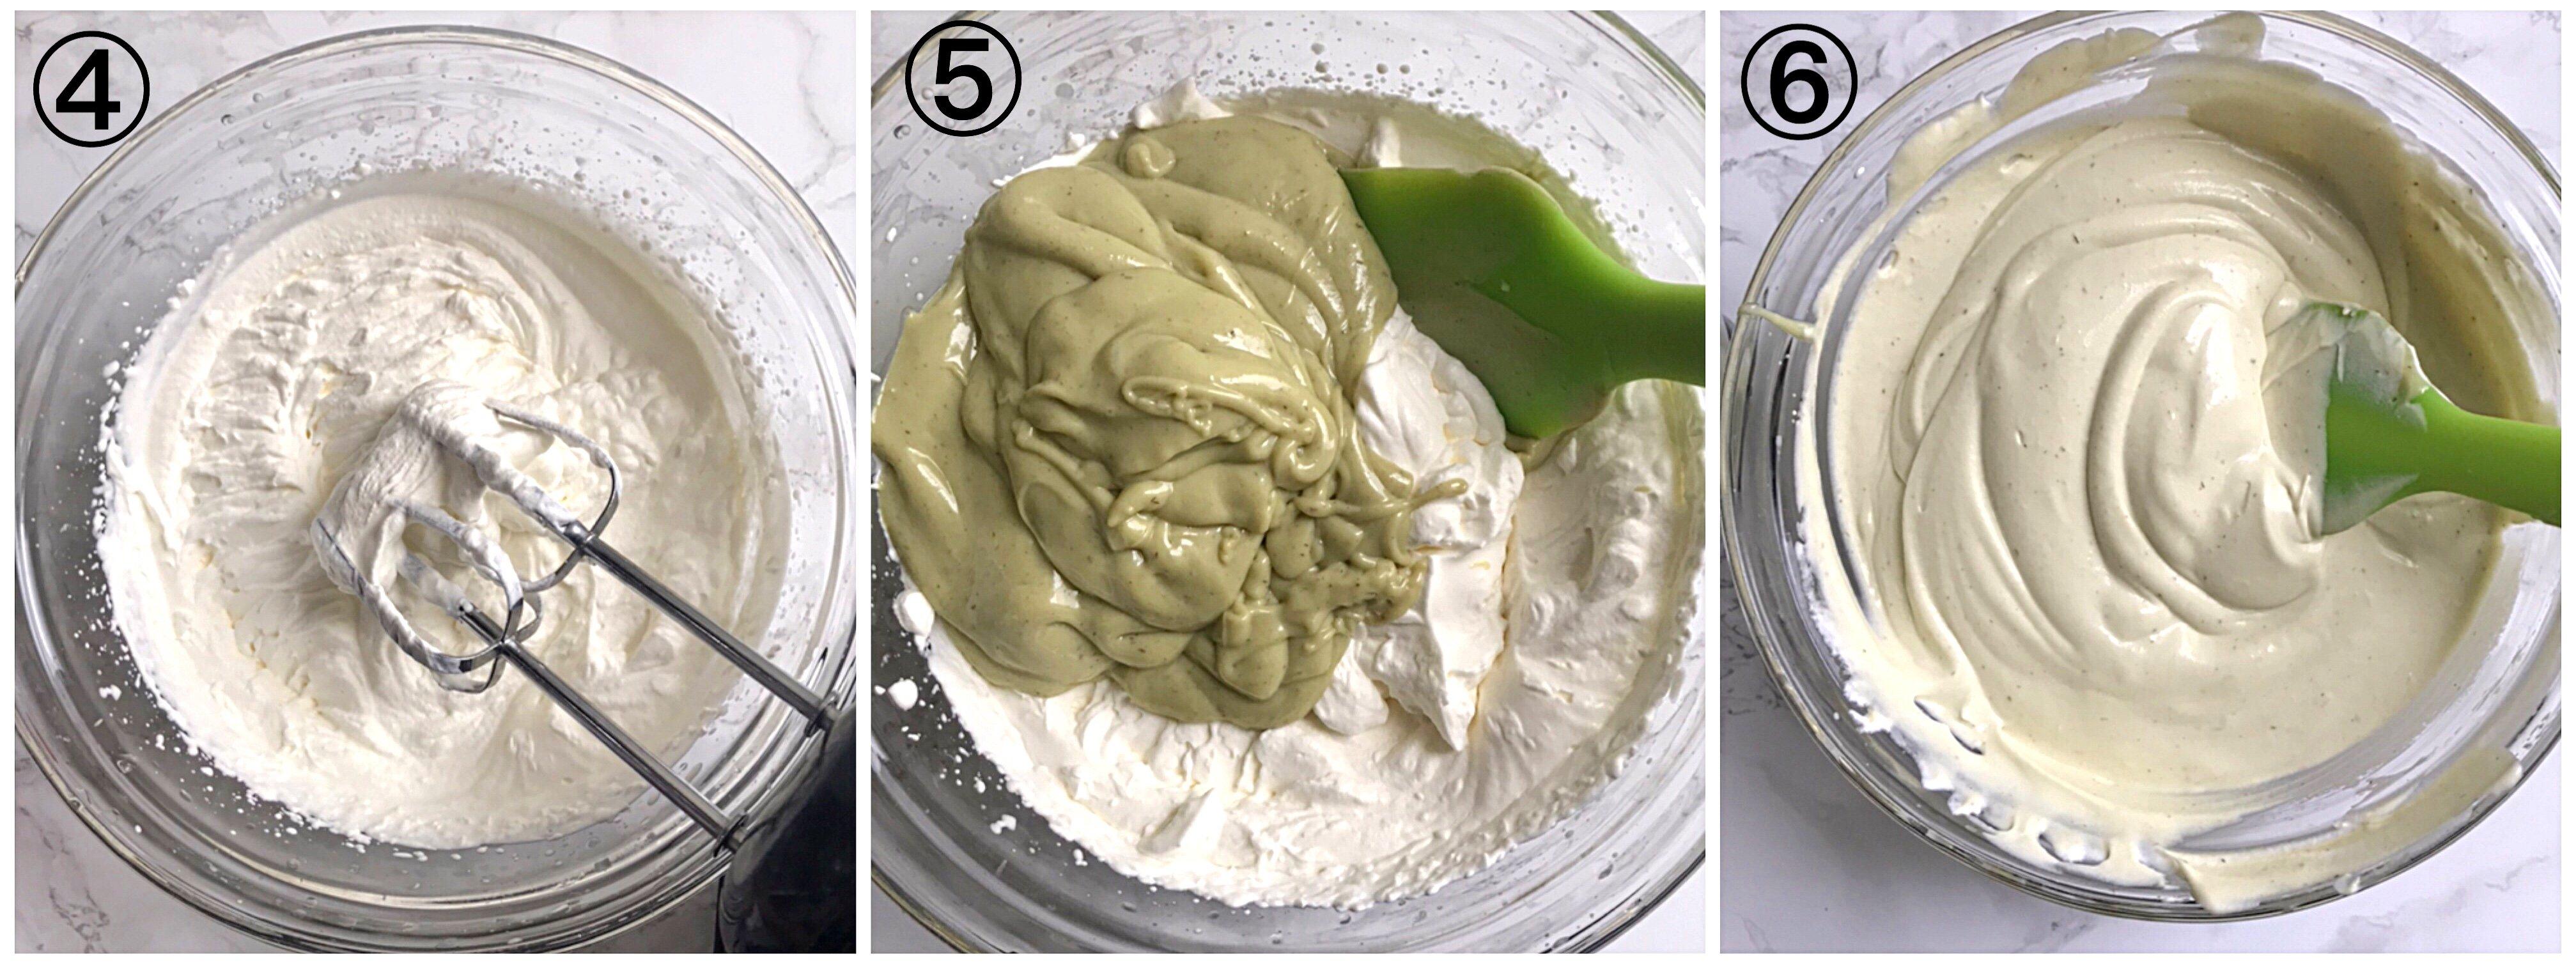 how to make avocado ice cream step by step photos